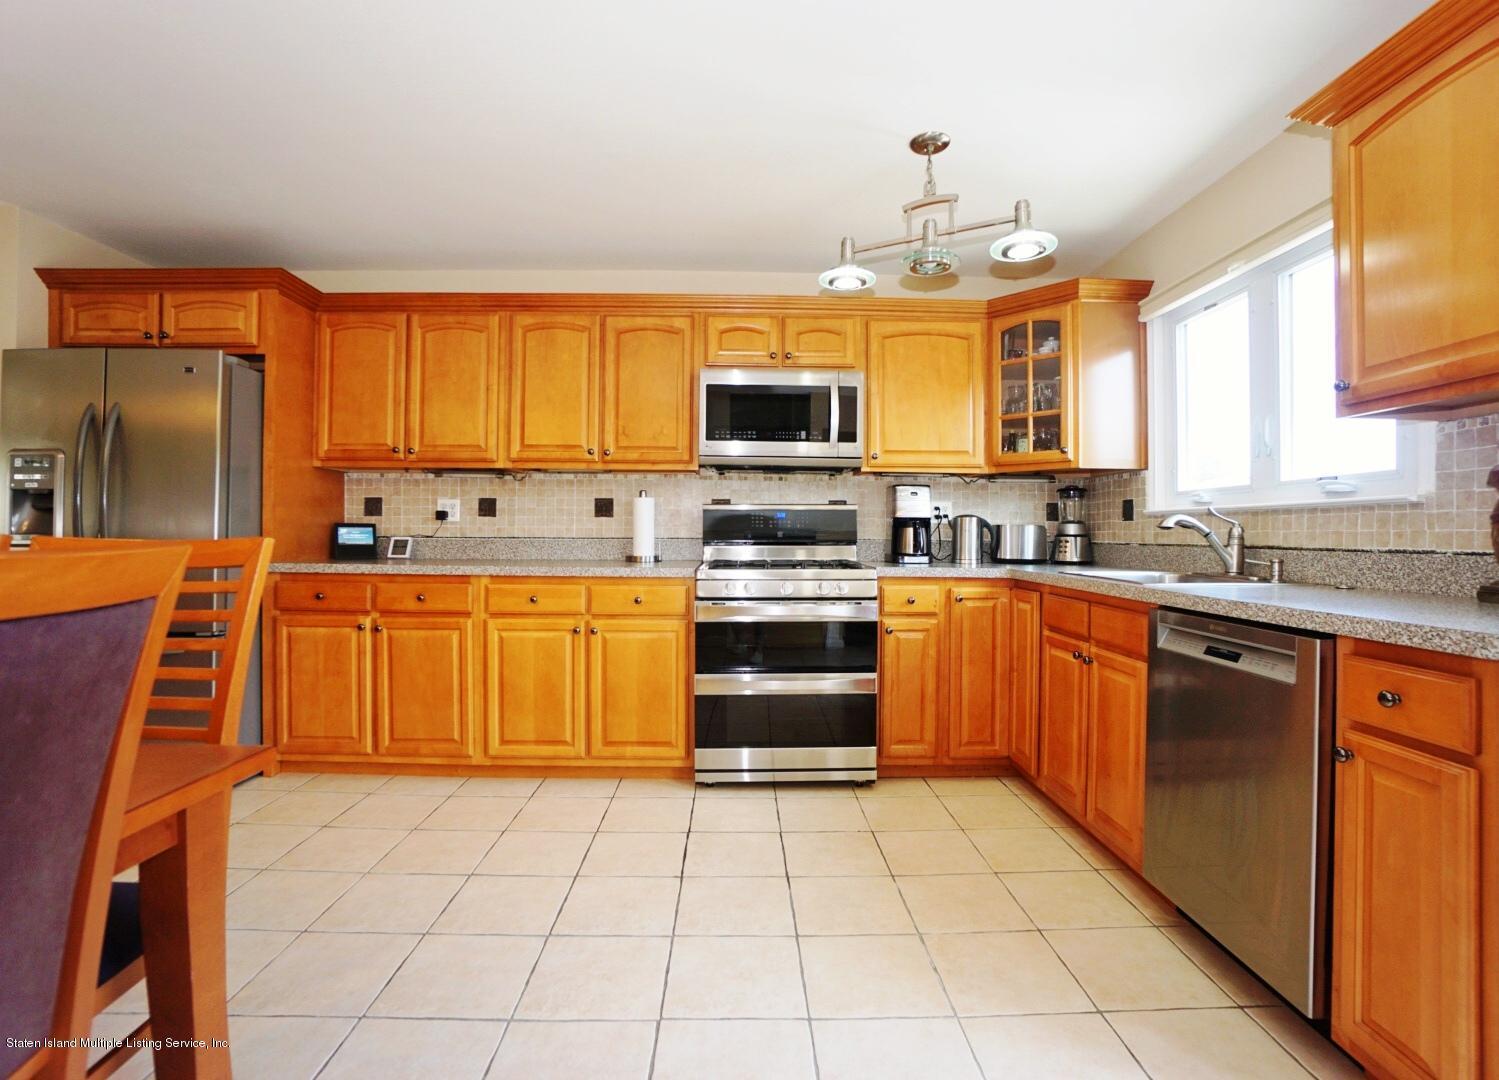 Single Family - Semi-Attached 18 Dunhill Lane  Staten Island, NY 10309, MLS-1139055-12